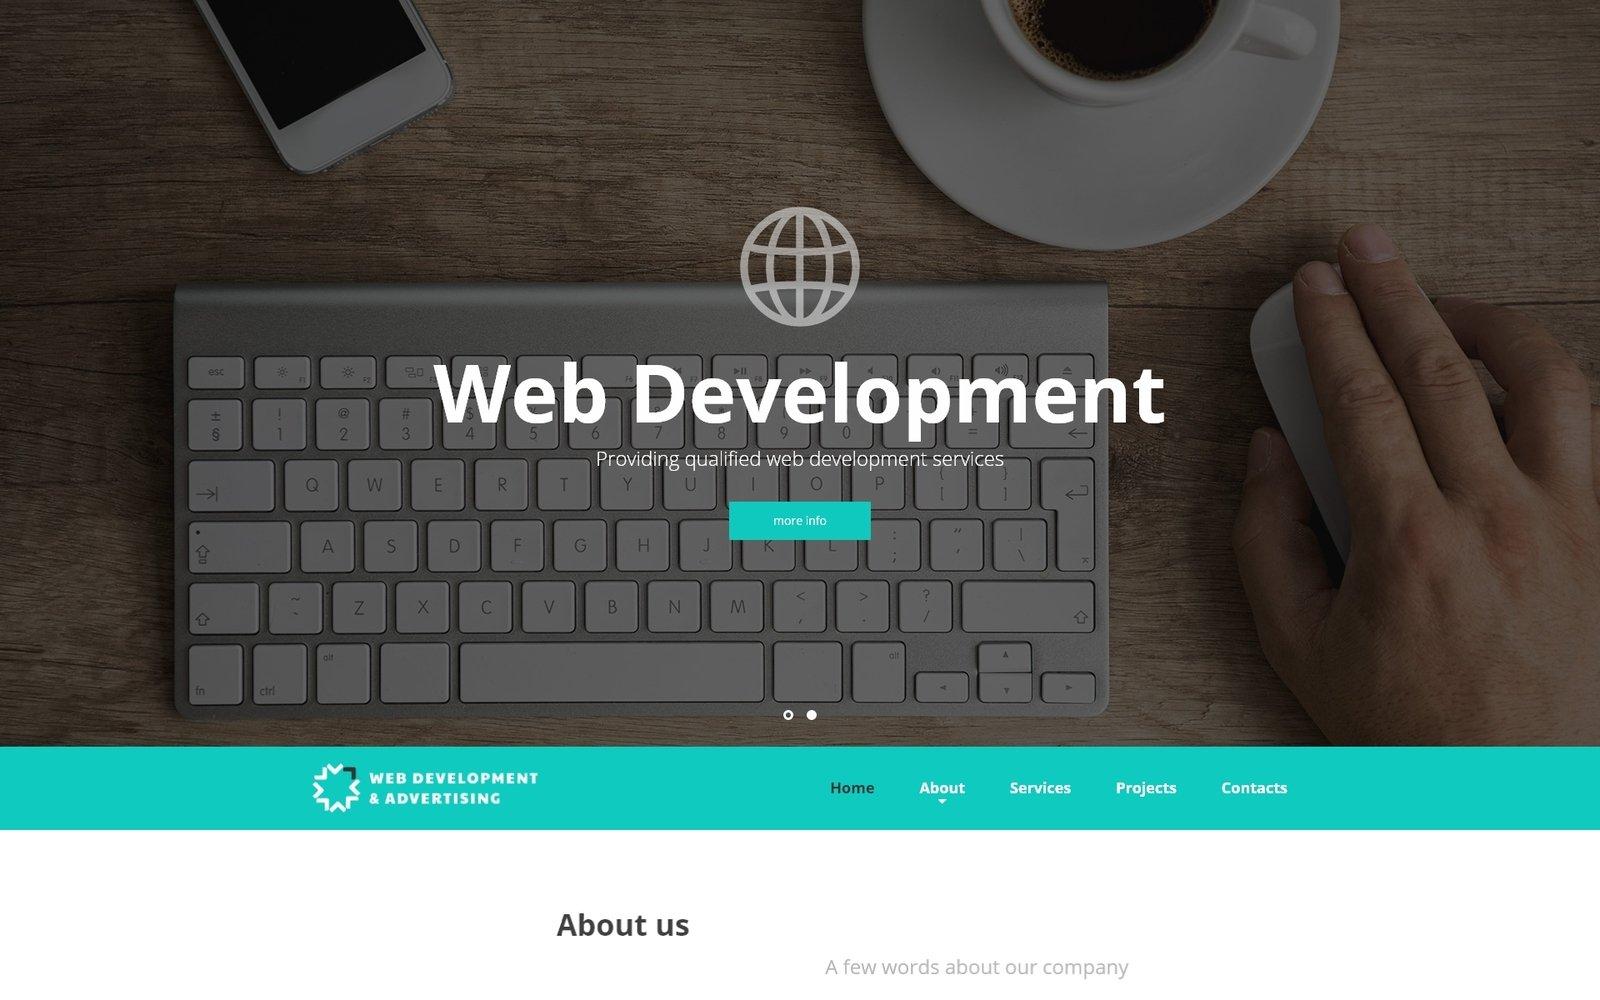 Web Development & Advertising - Web Development Responsive №52537